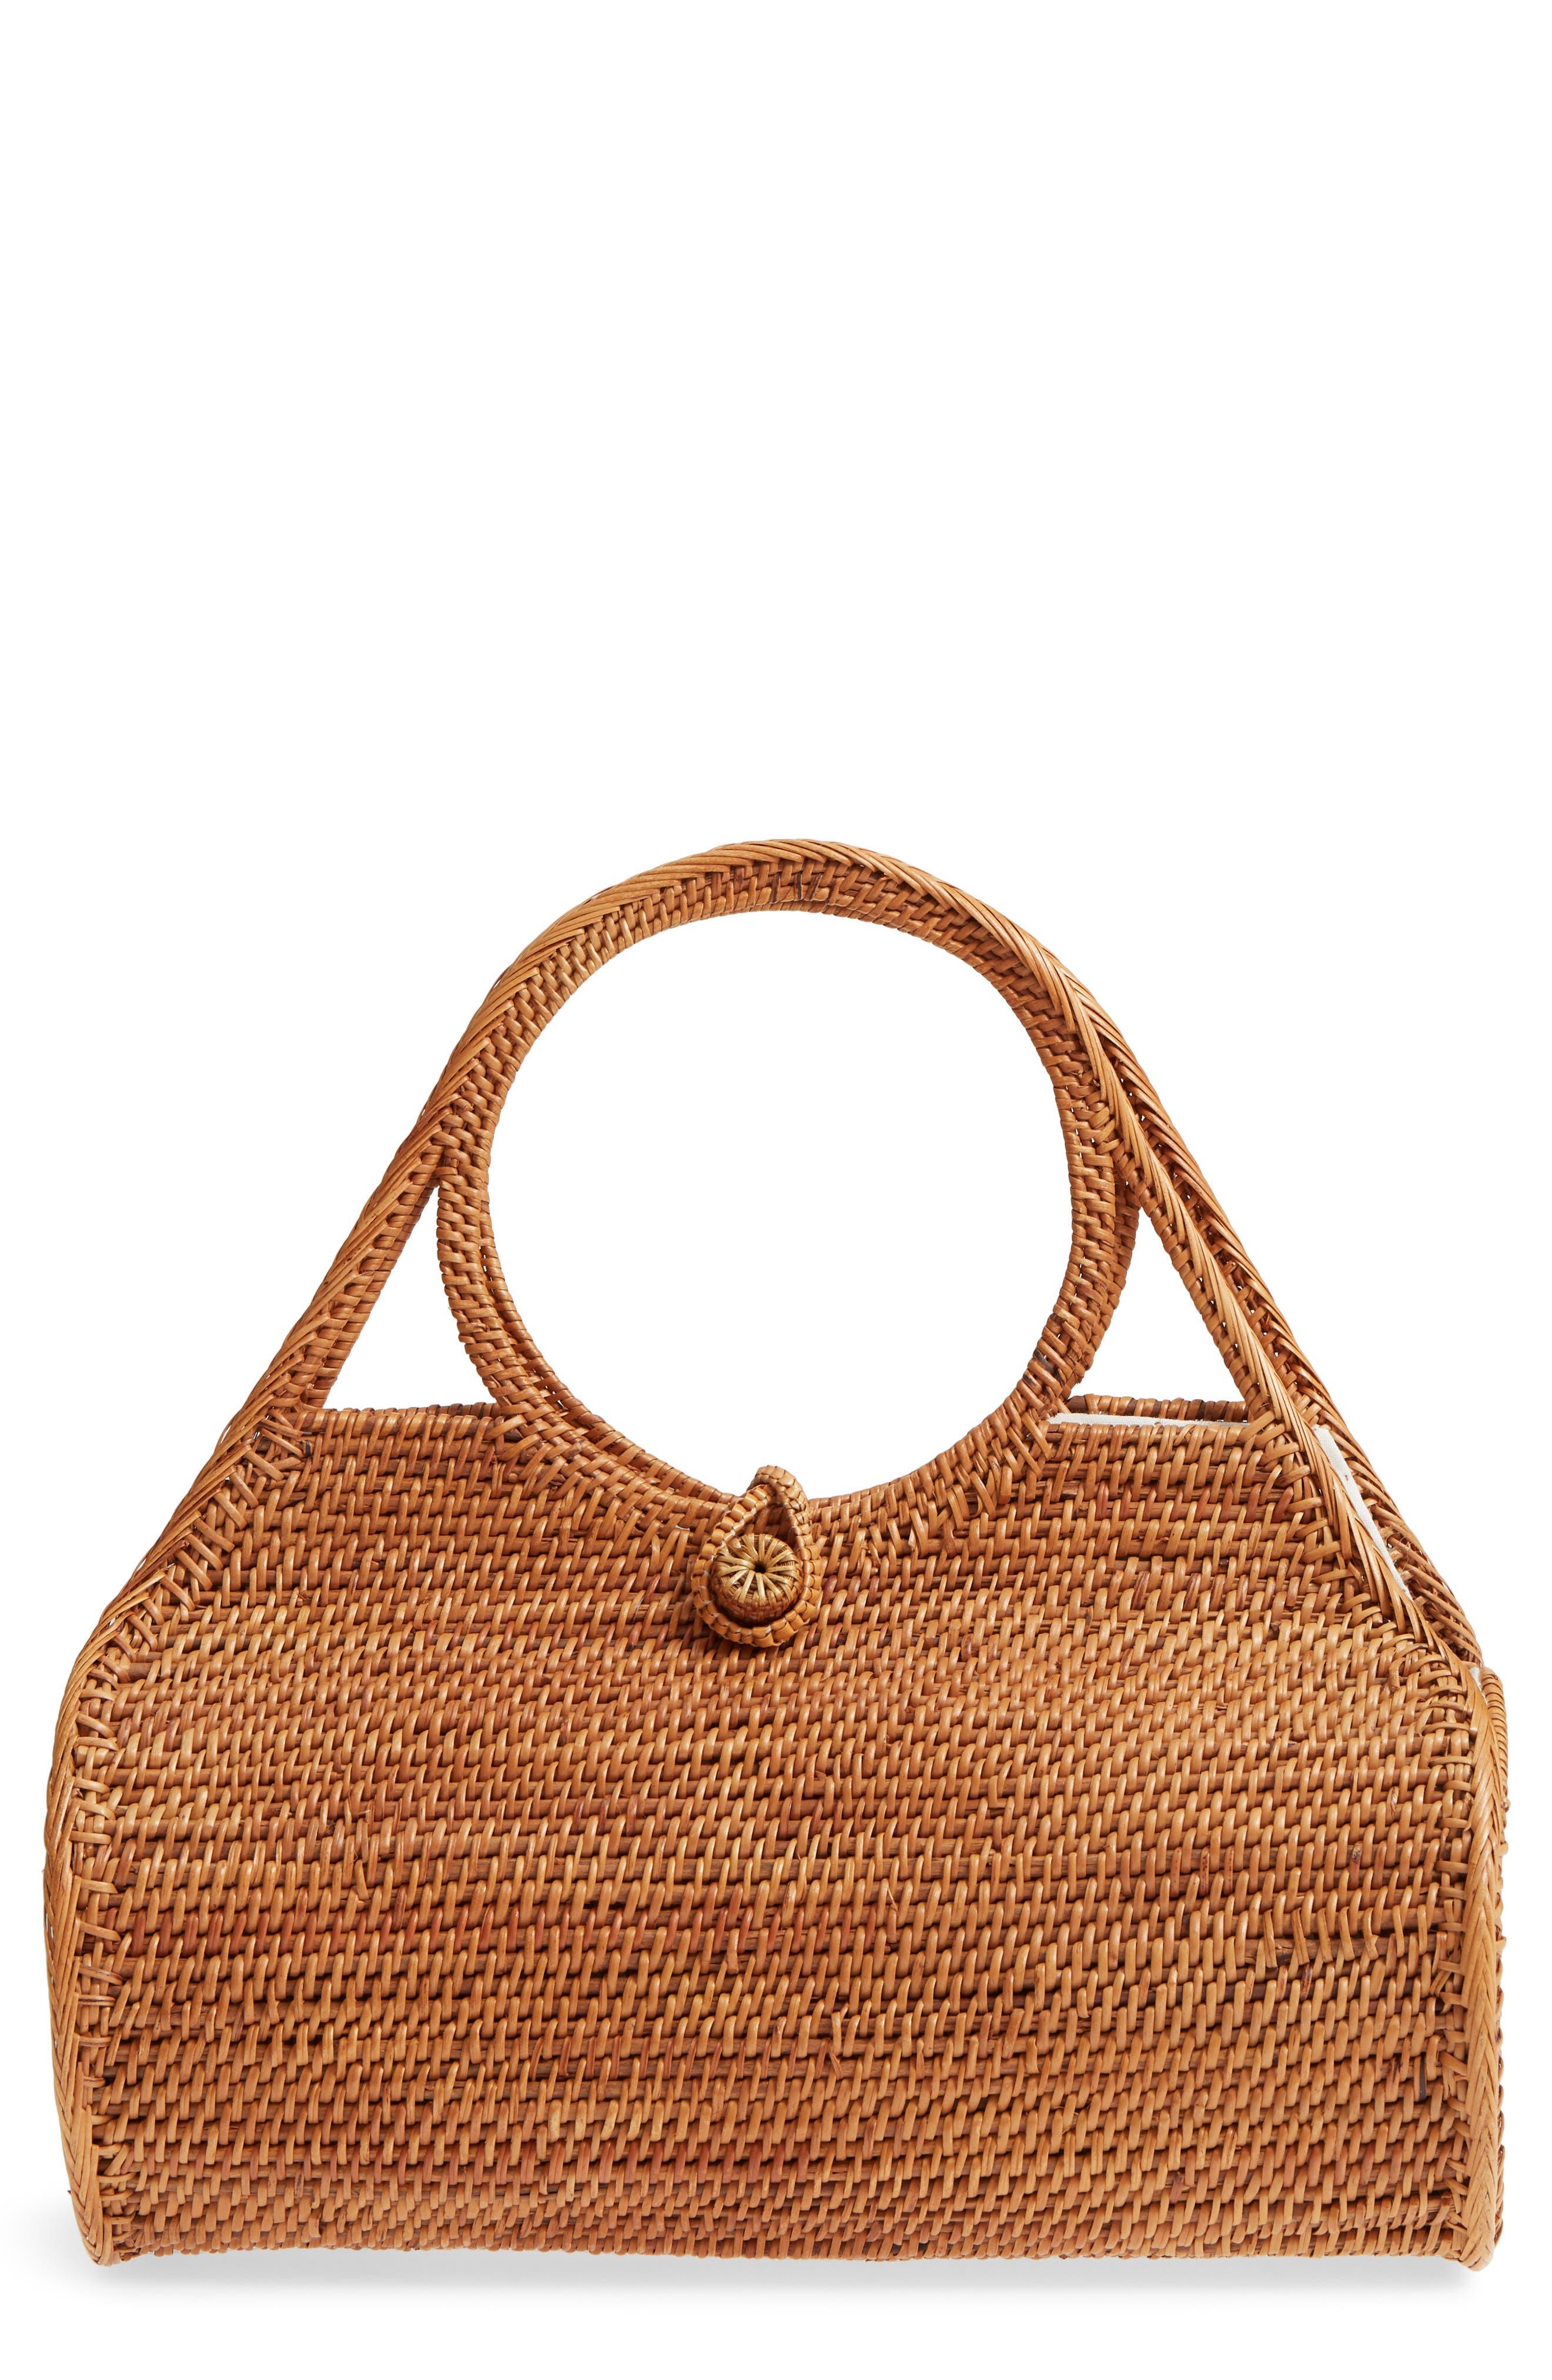 Woven Rattan Handbag,                             Main thumbnail 1, color,                             230